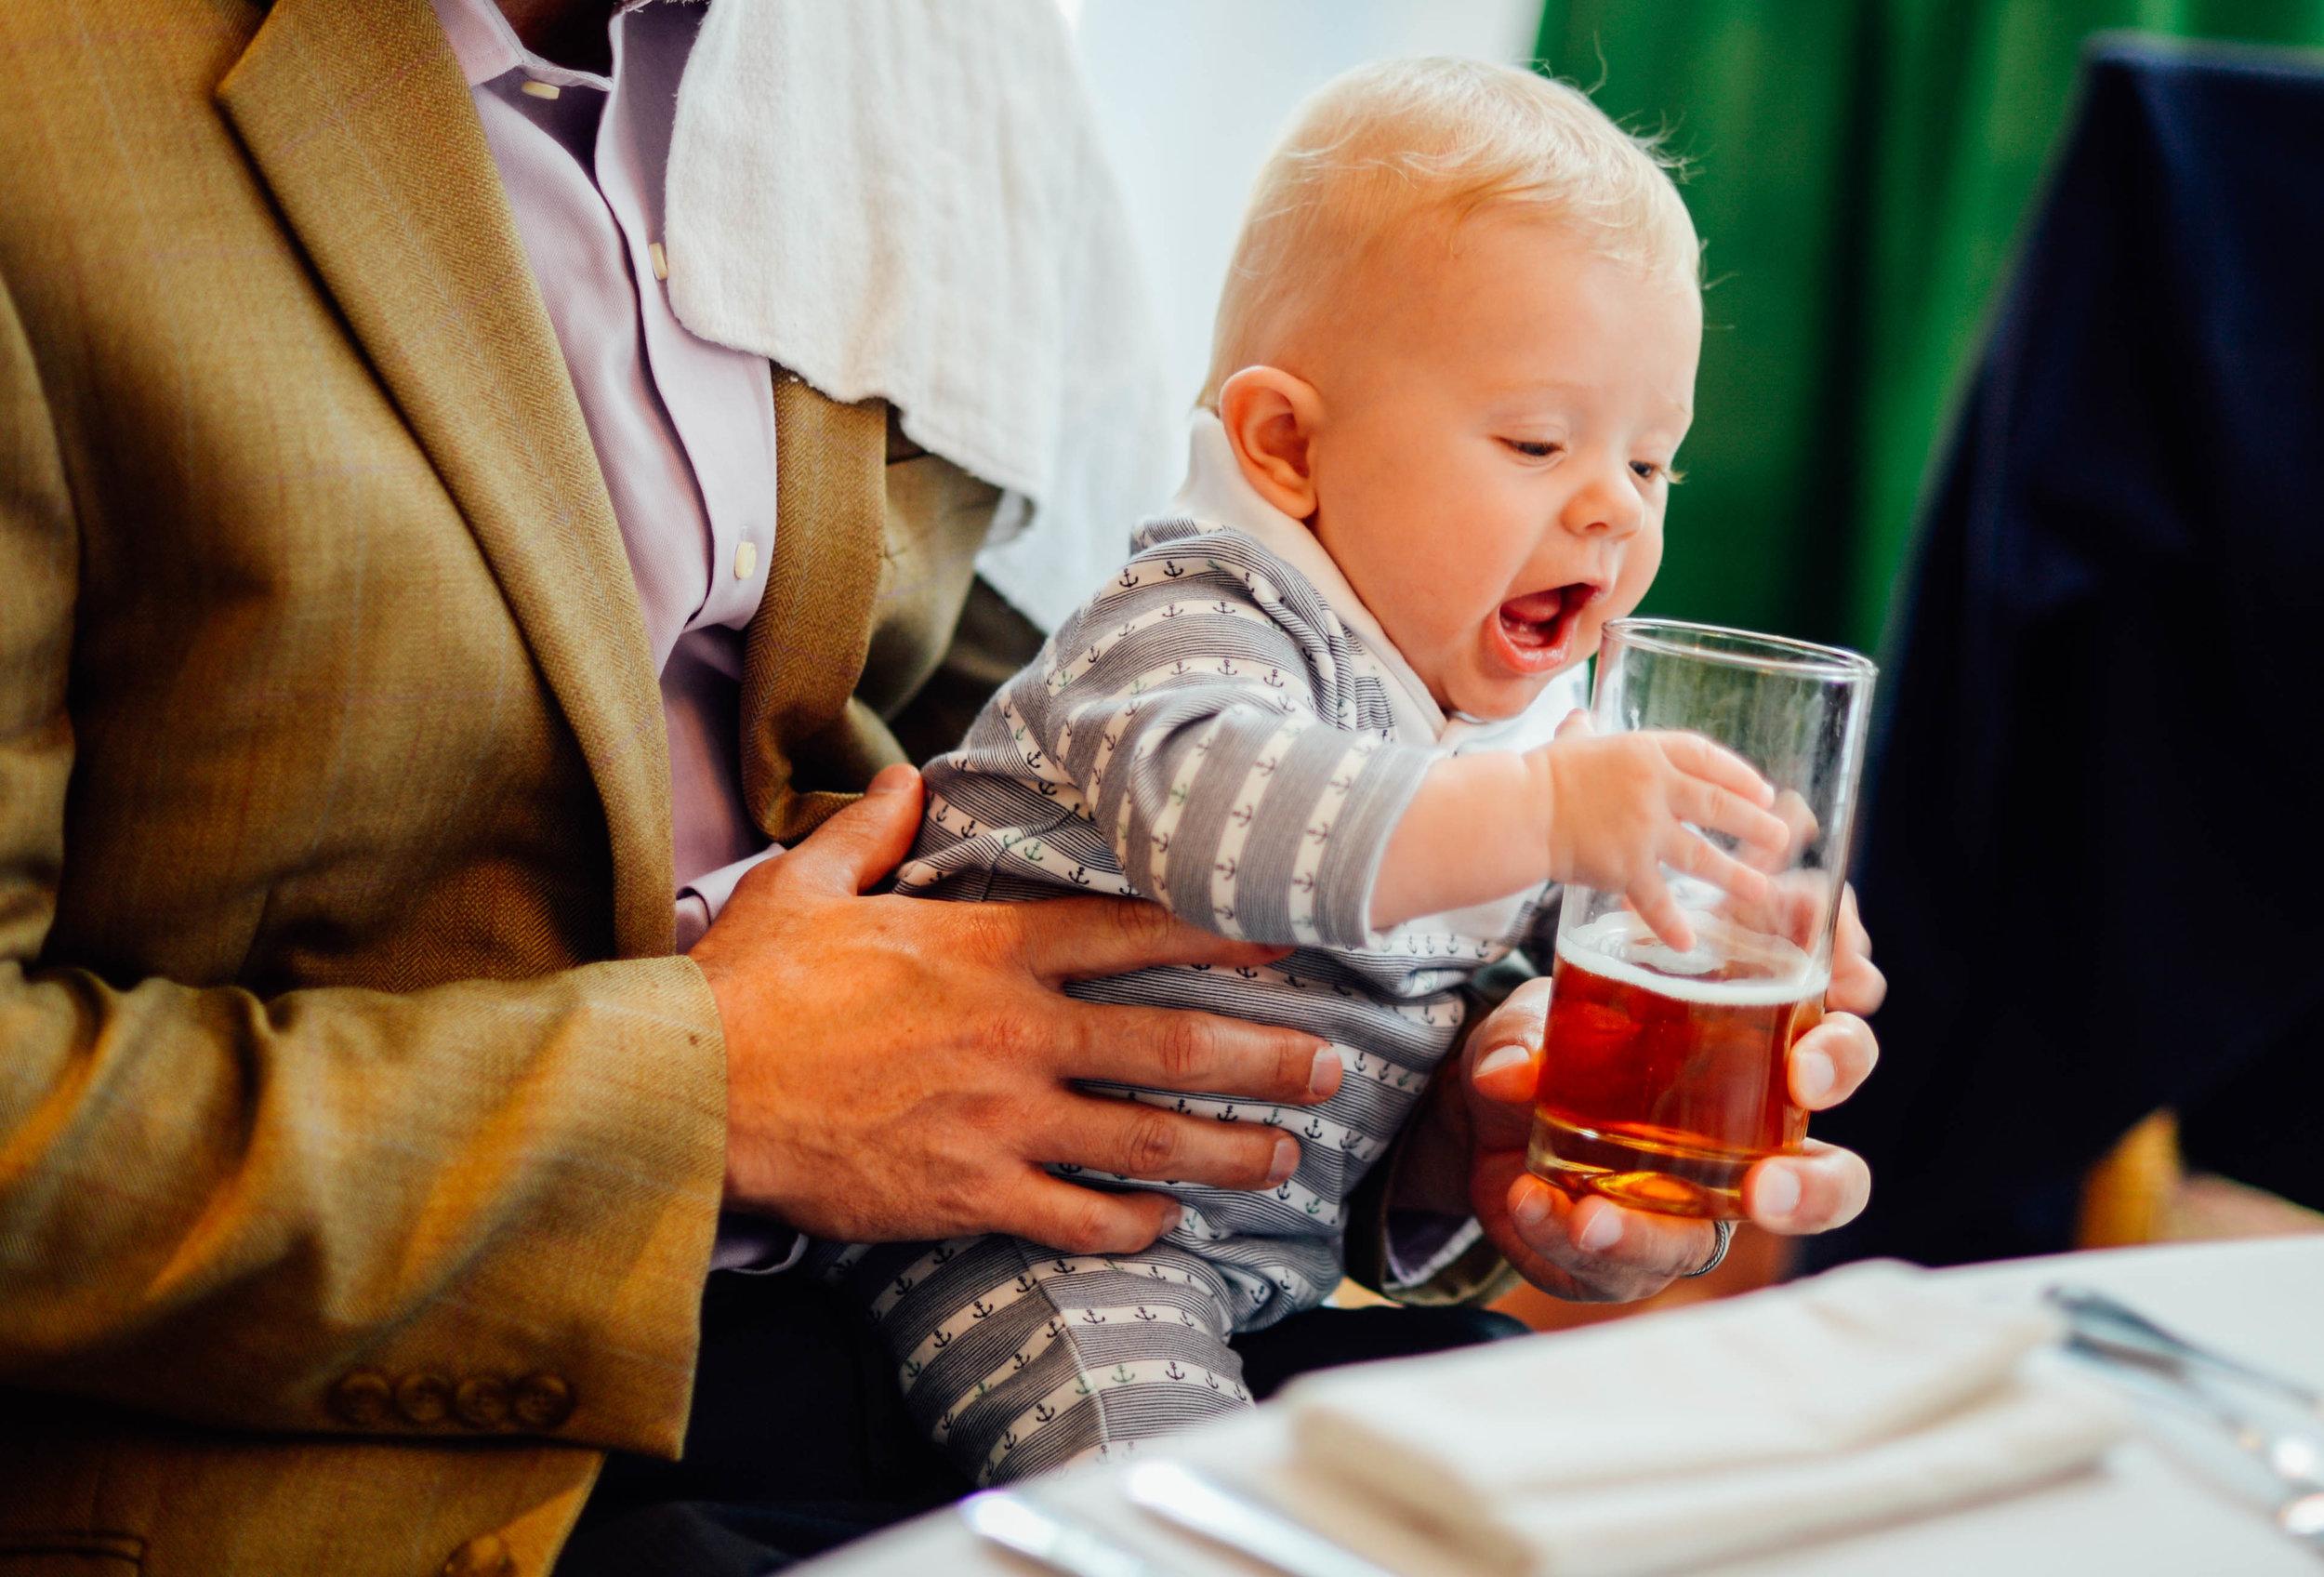 Baby and beer 2941 Restaurant Koi Pond Wedding Reception Falls Church